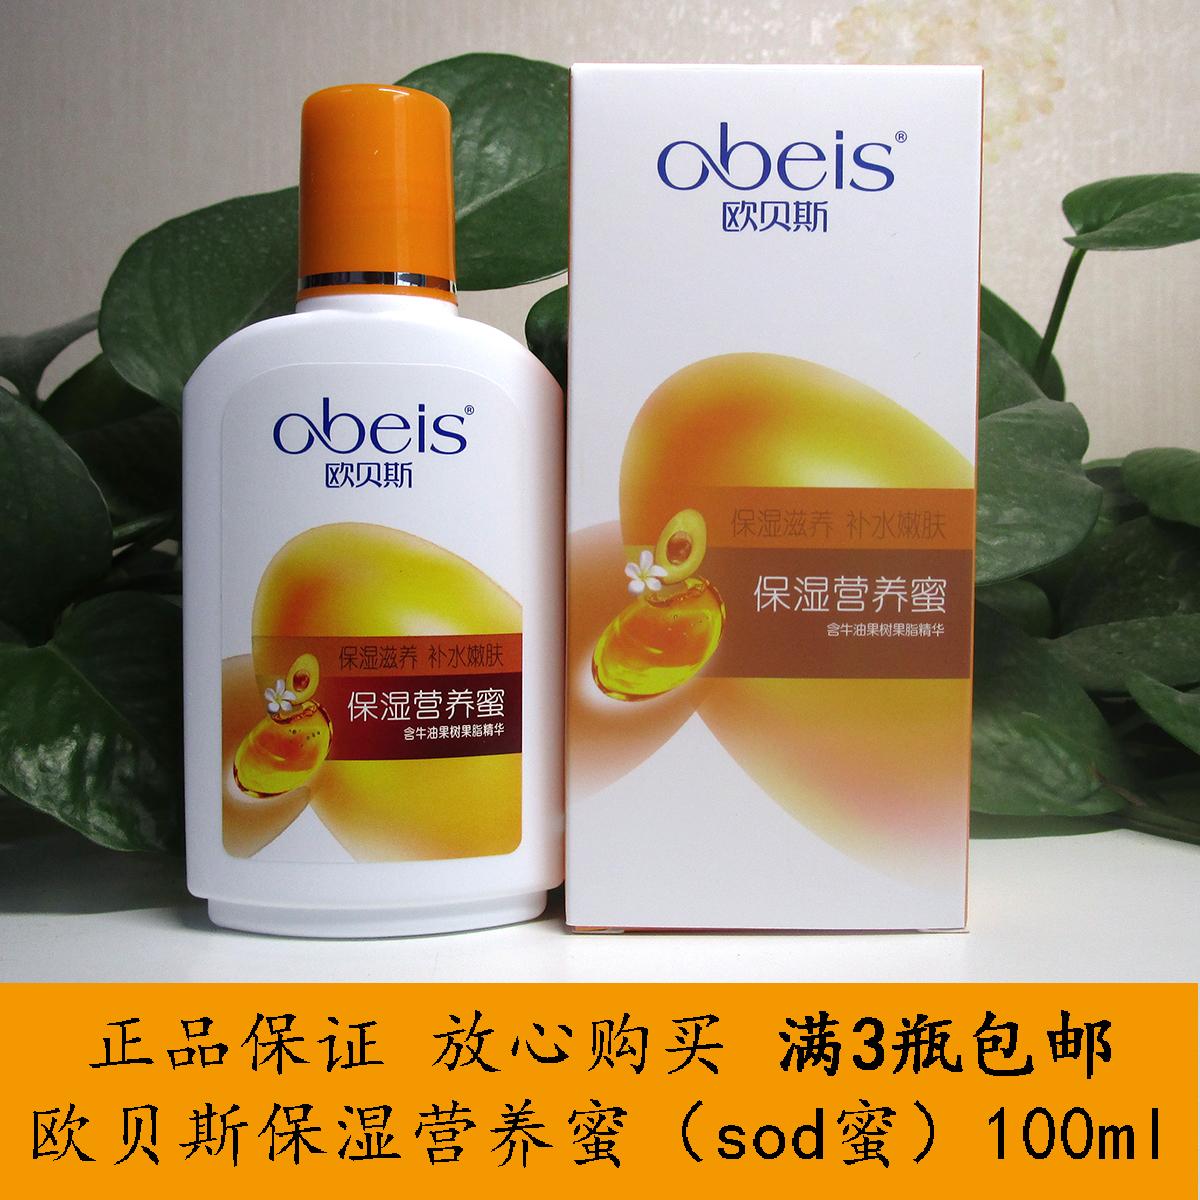 Nourishing honey, SOD honey, direct moisturizing, moisturizing and moisturizing facial cream.